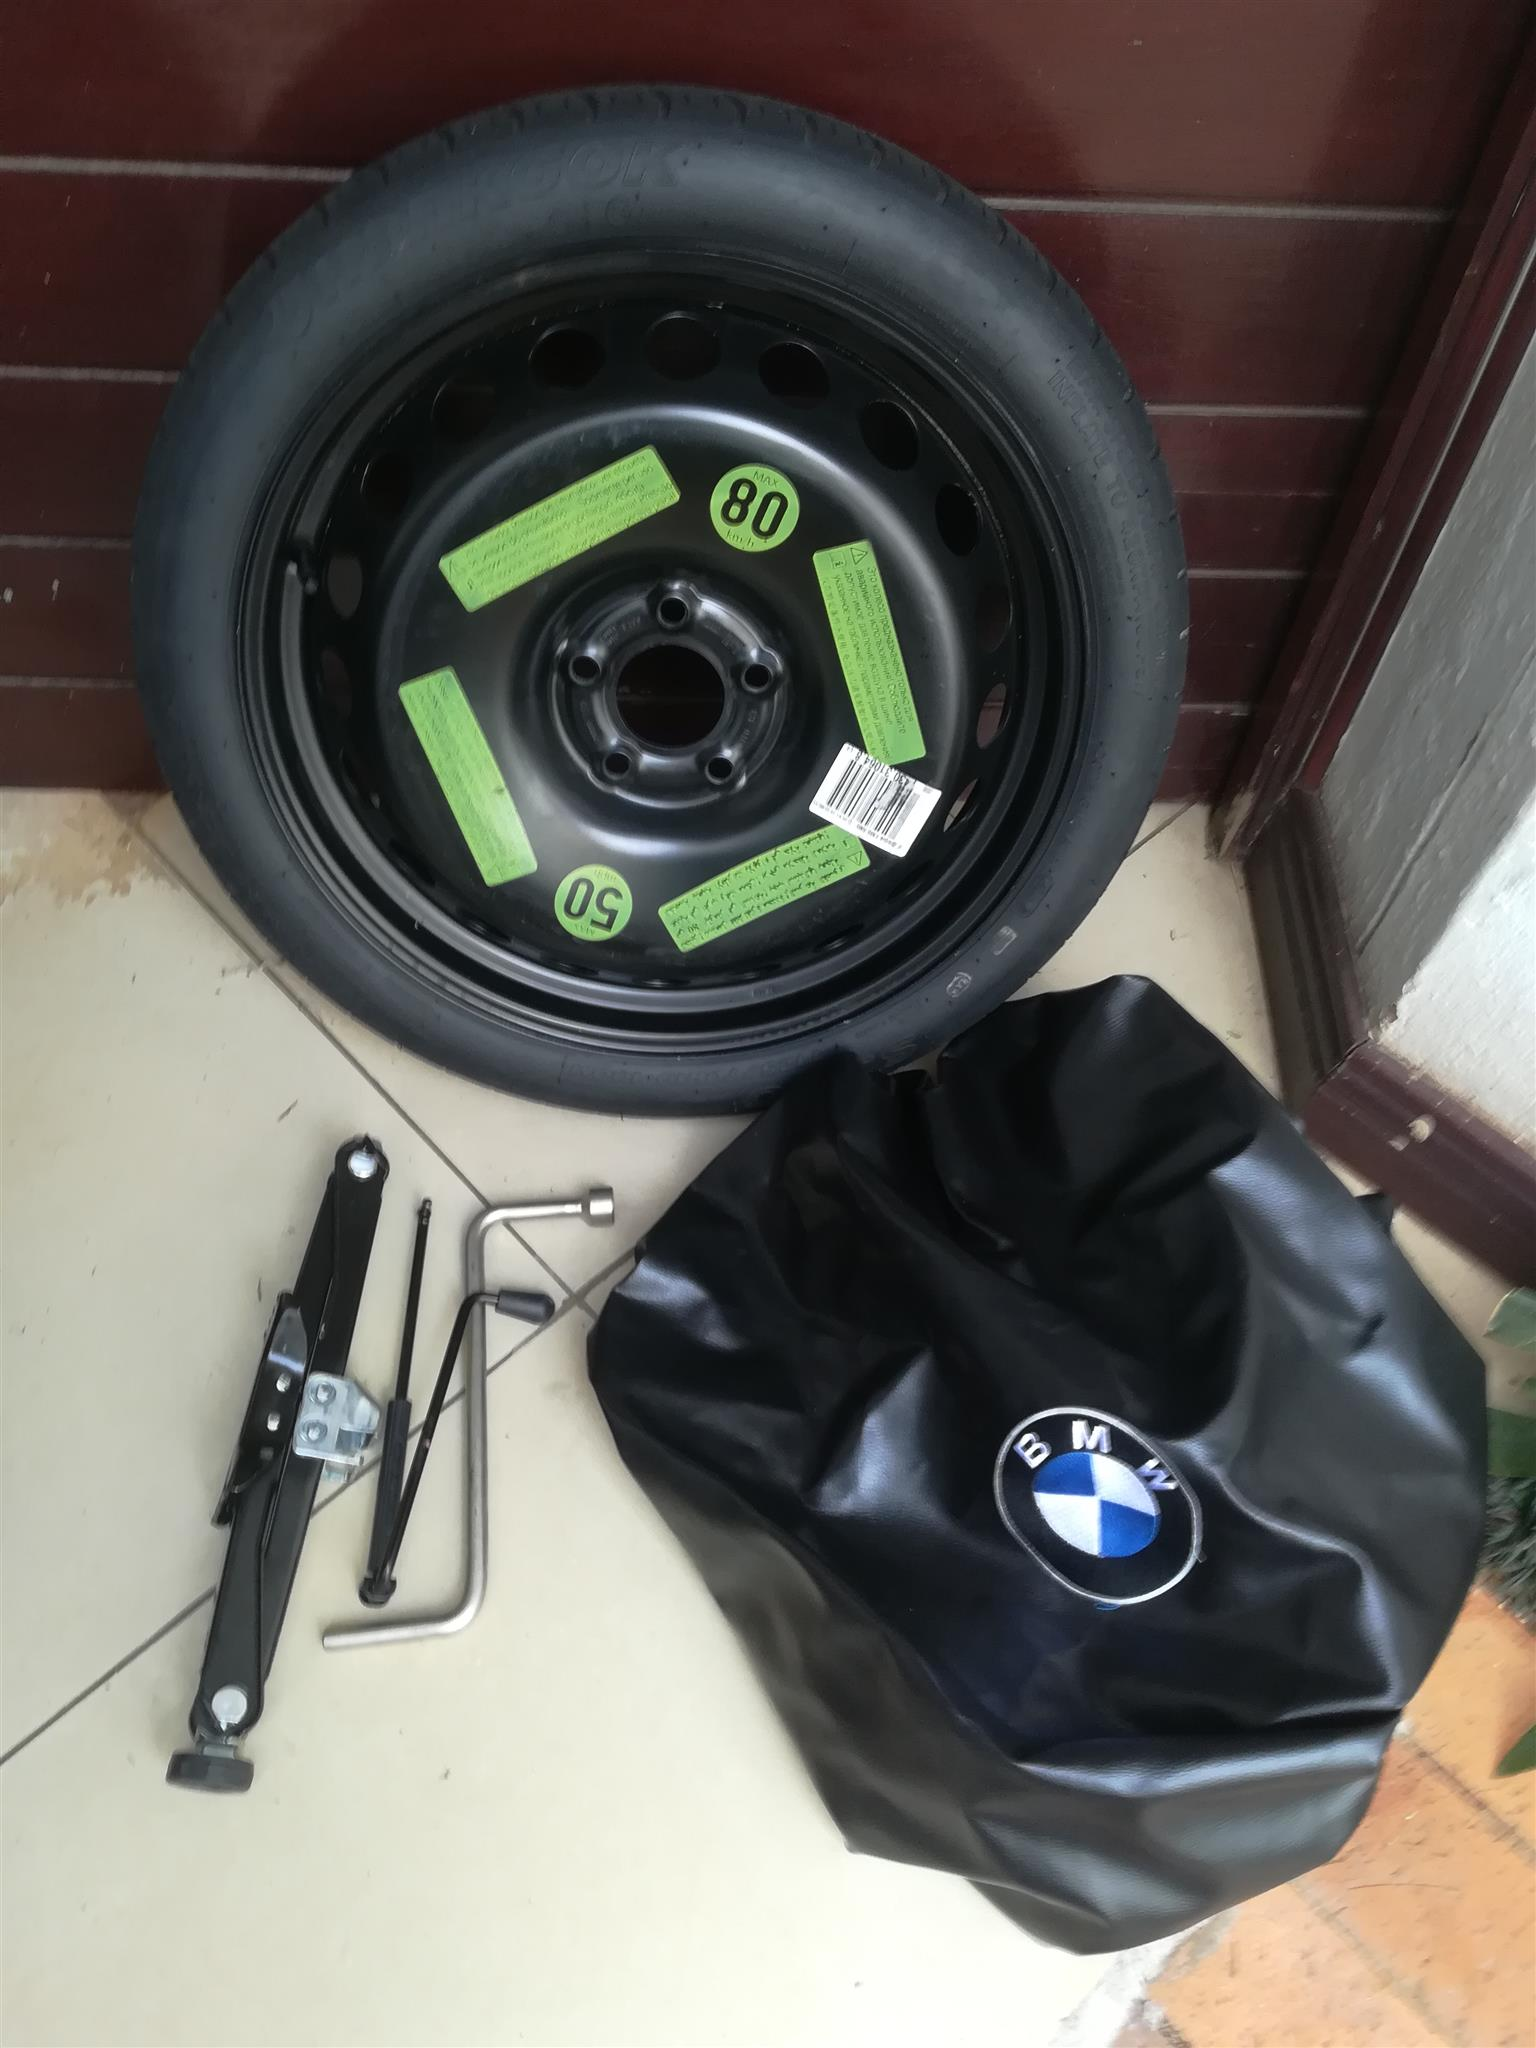 Bmw E90 E92 E93 V8 M3 19 Inch Space Saver Spare Wheel With Bag And Tools Junk Mail